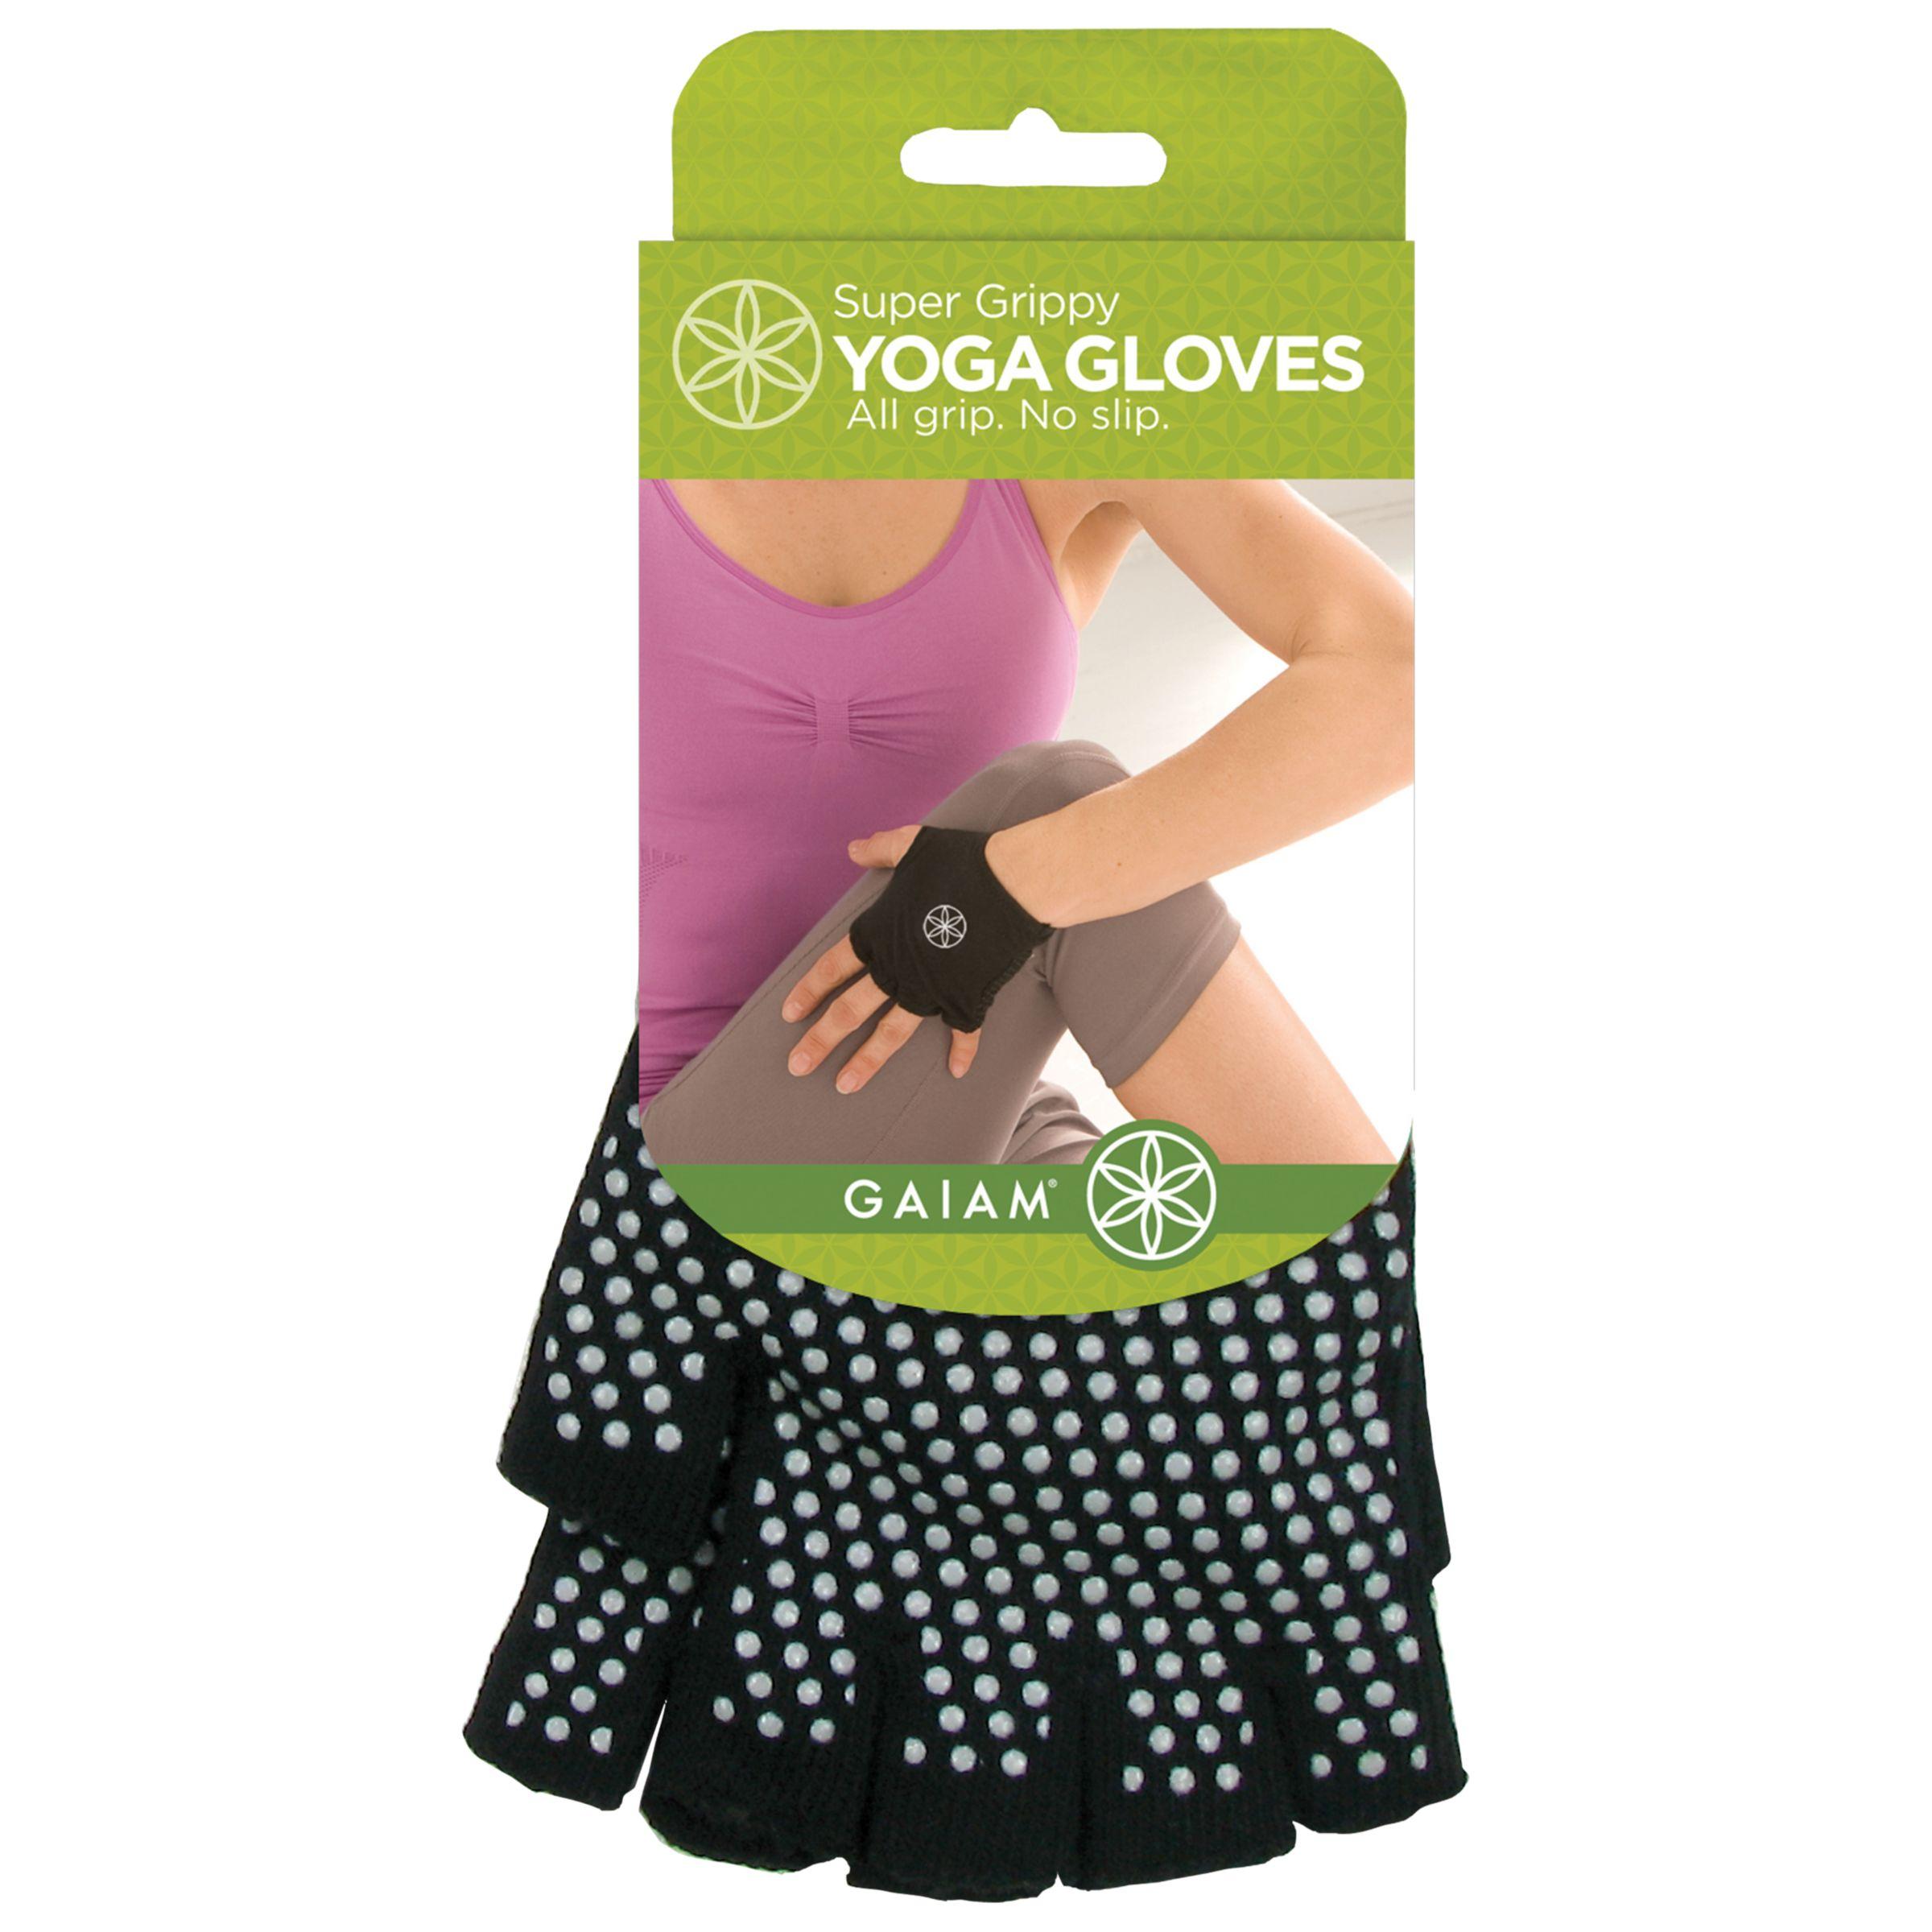 Gaiam Gaiam Super Grippy Yoga Gloves